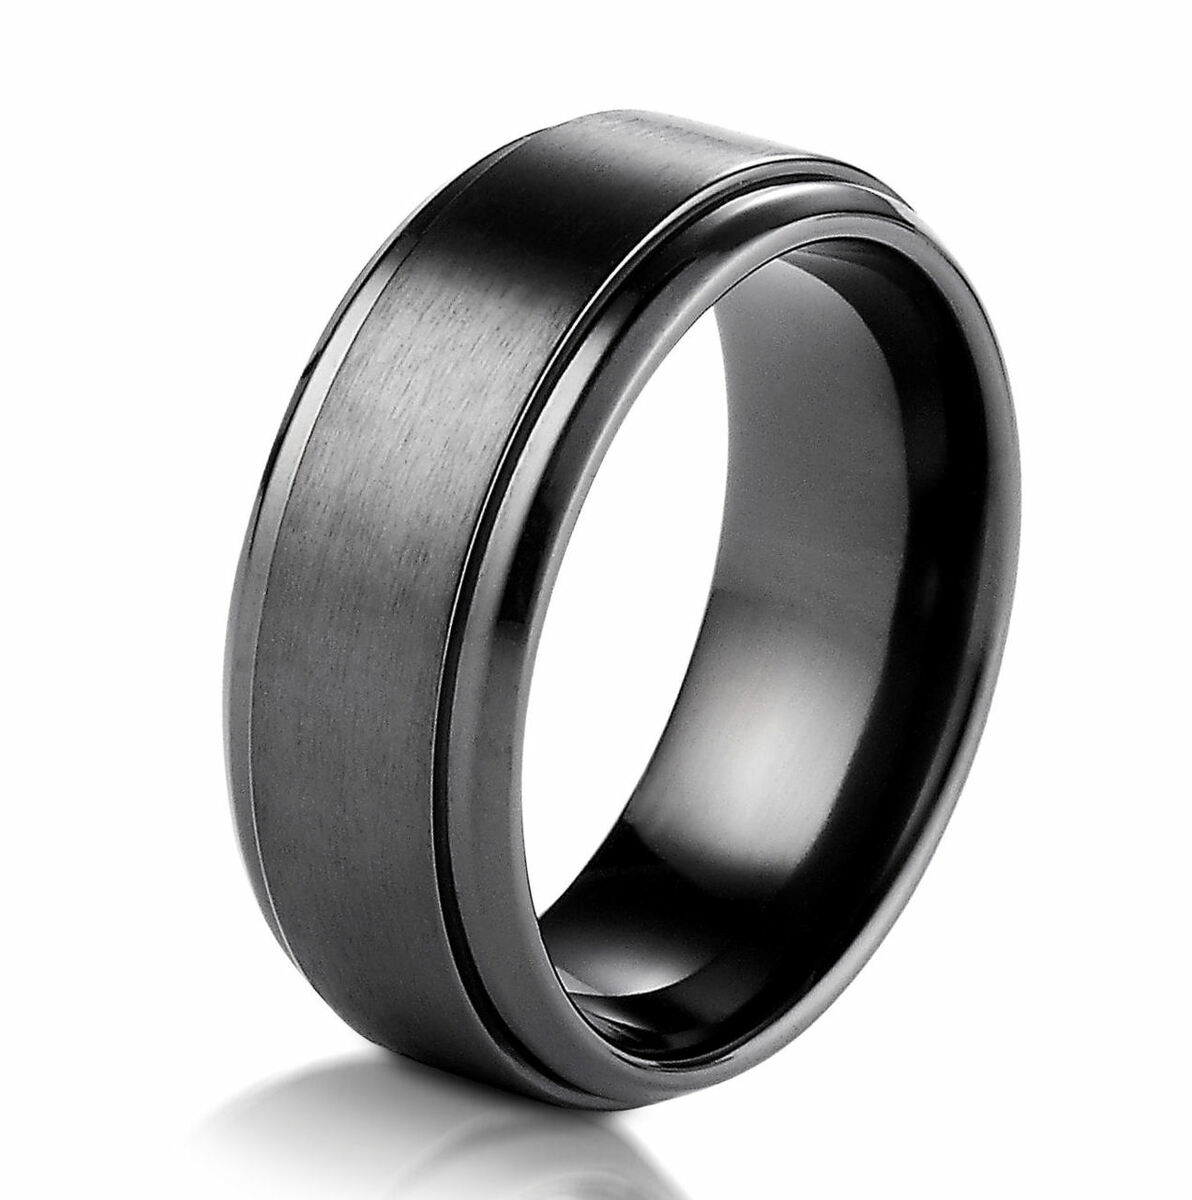 Black Cobalt Chrome Classic Wedding Ring